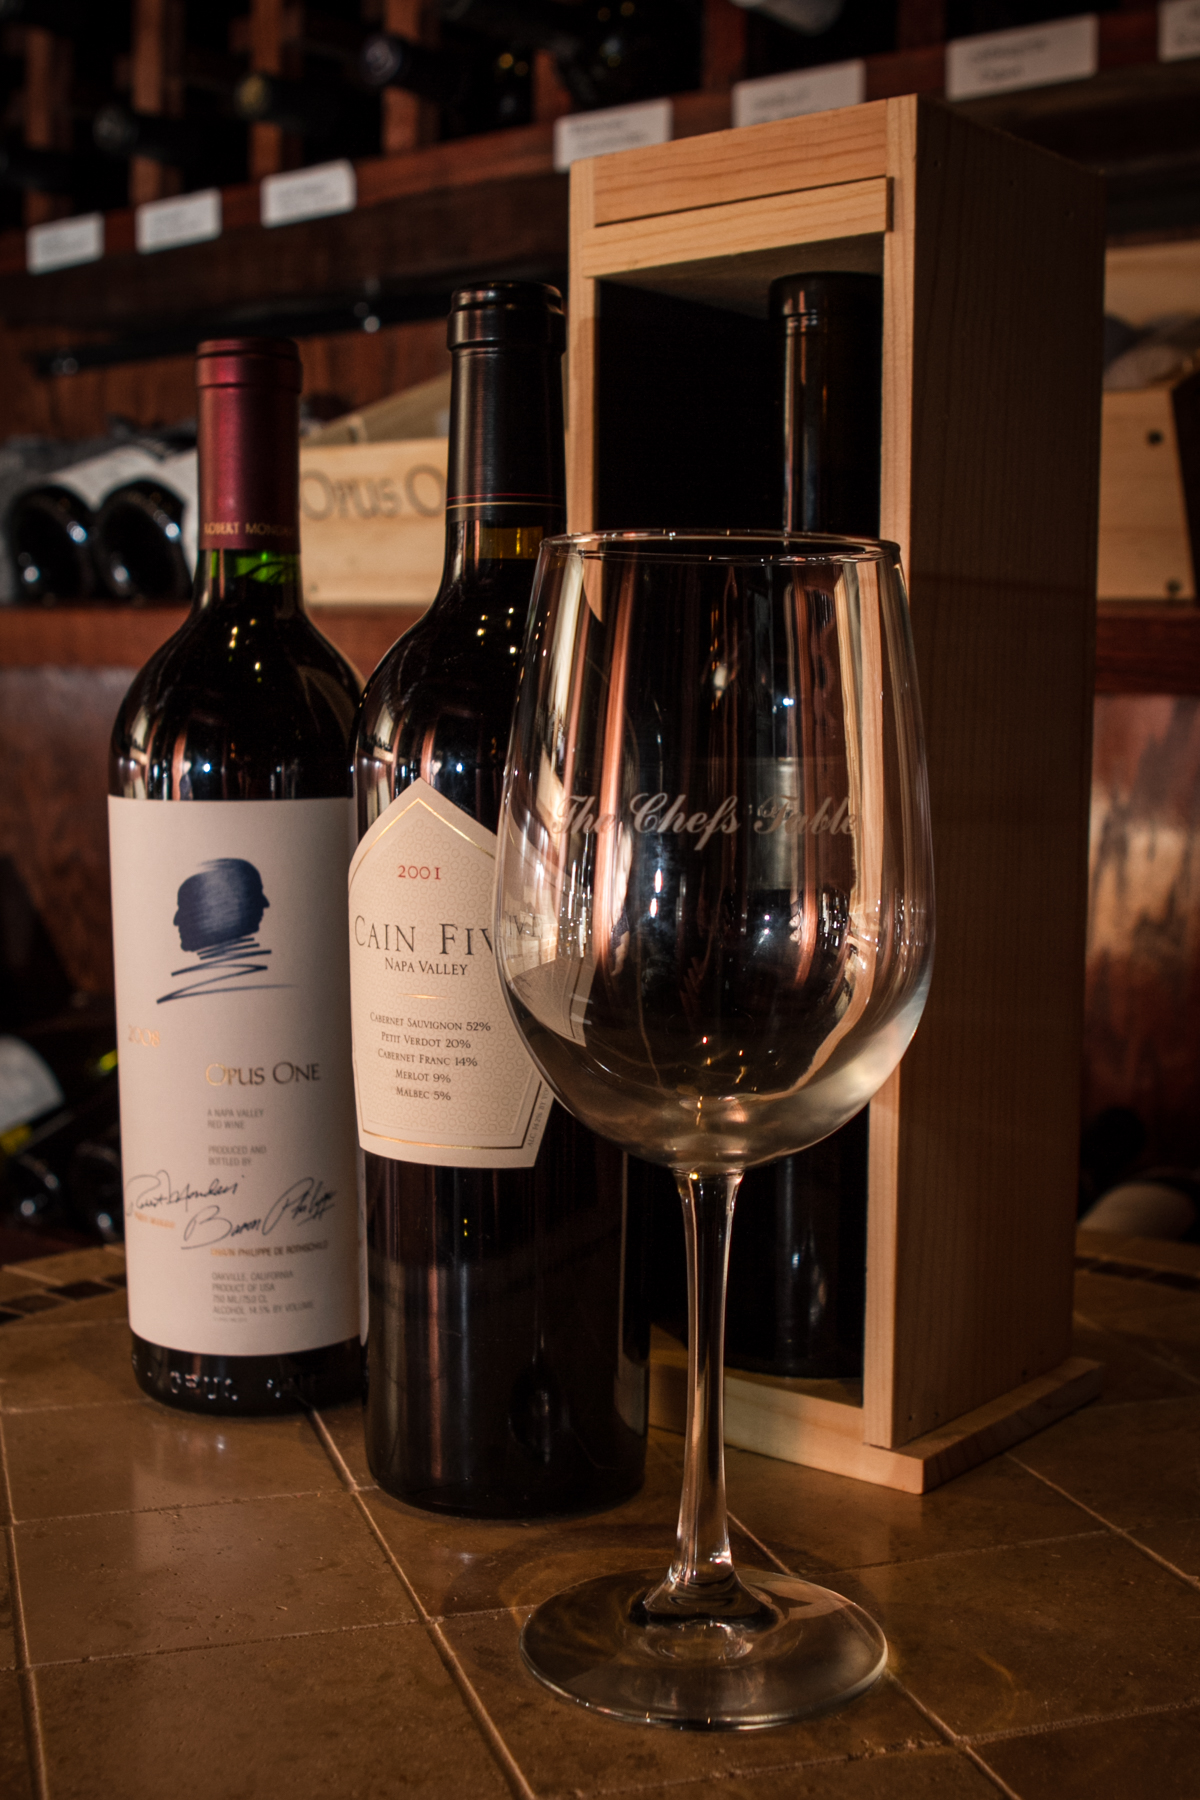 chefs-table-wines.jpg